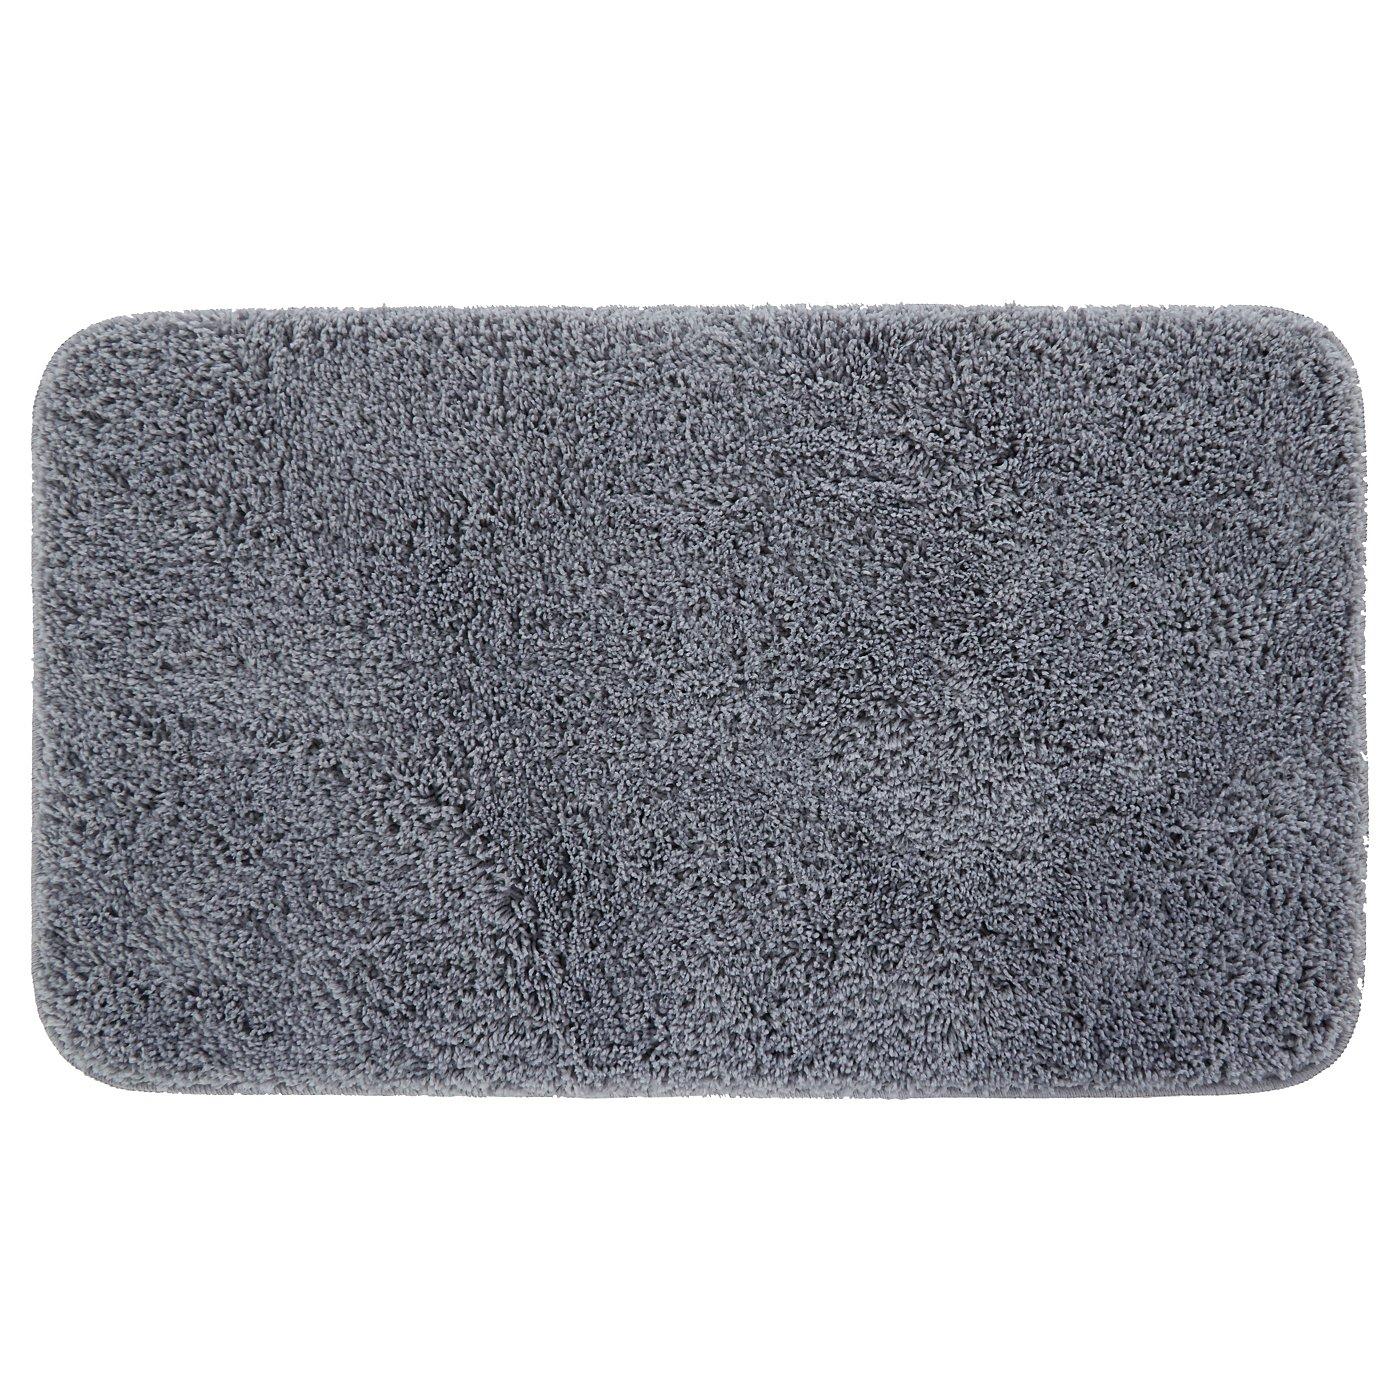 Microfiber Anti slip Rubber Backed Bath Mat - 50 x 80cm (Grey) Home Trends